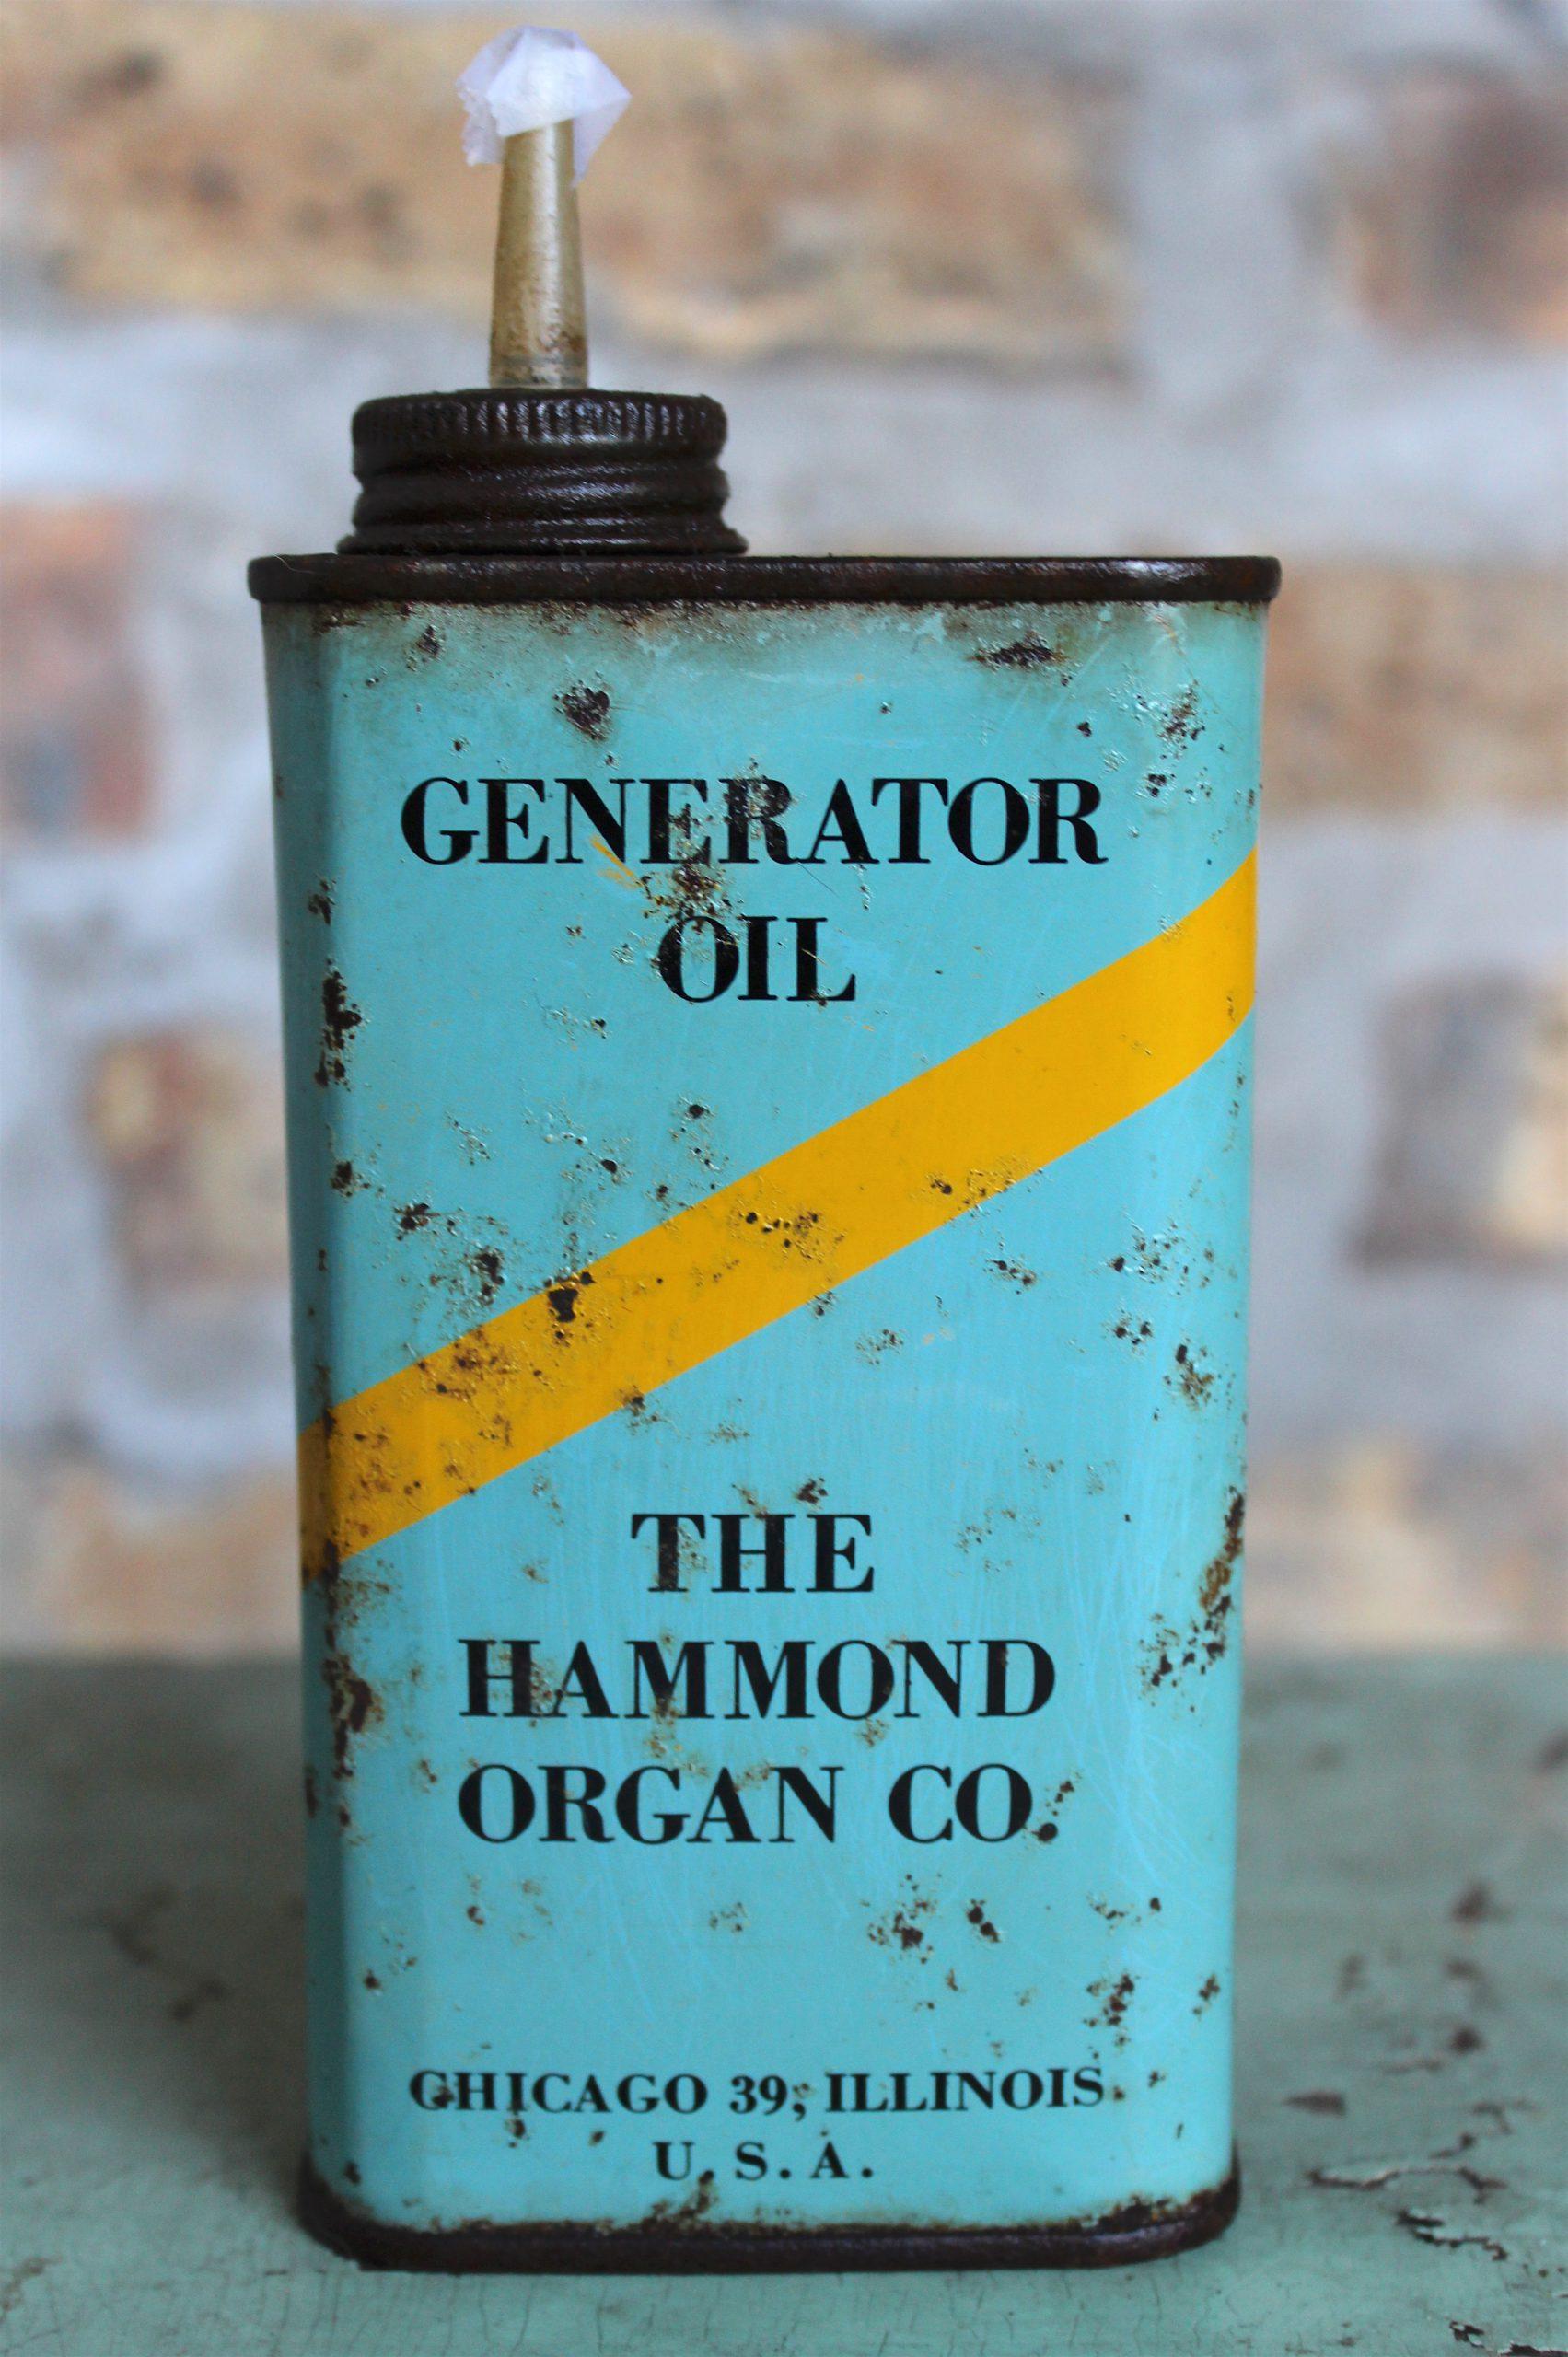 Hammond Organ Company, est. 1928